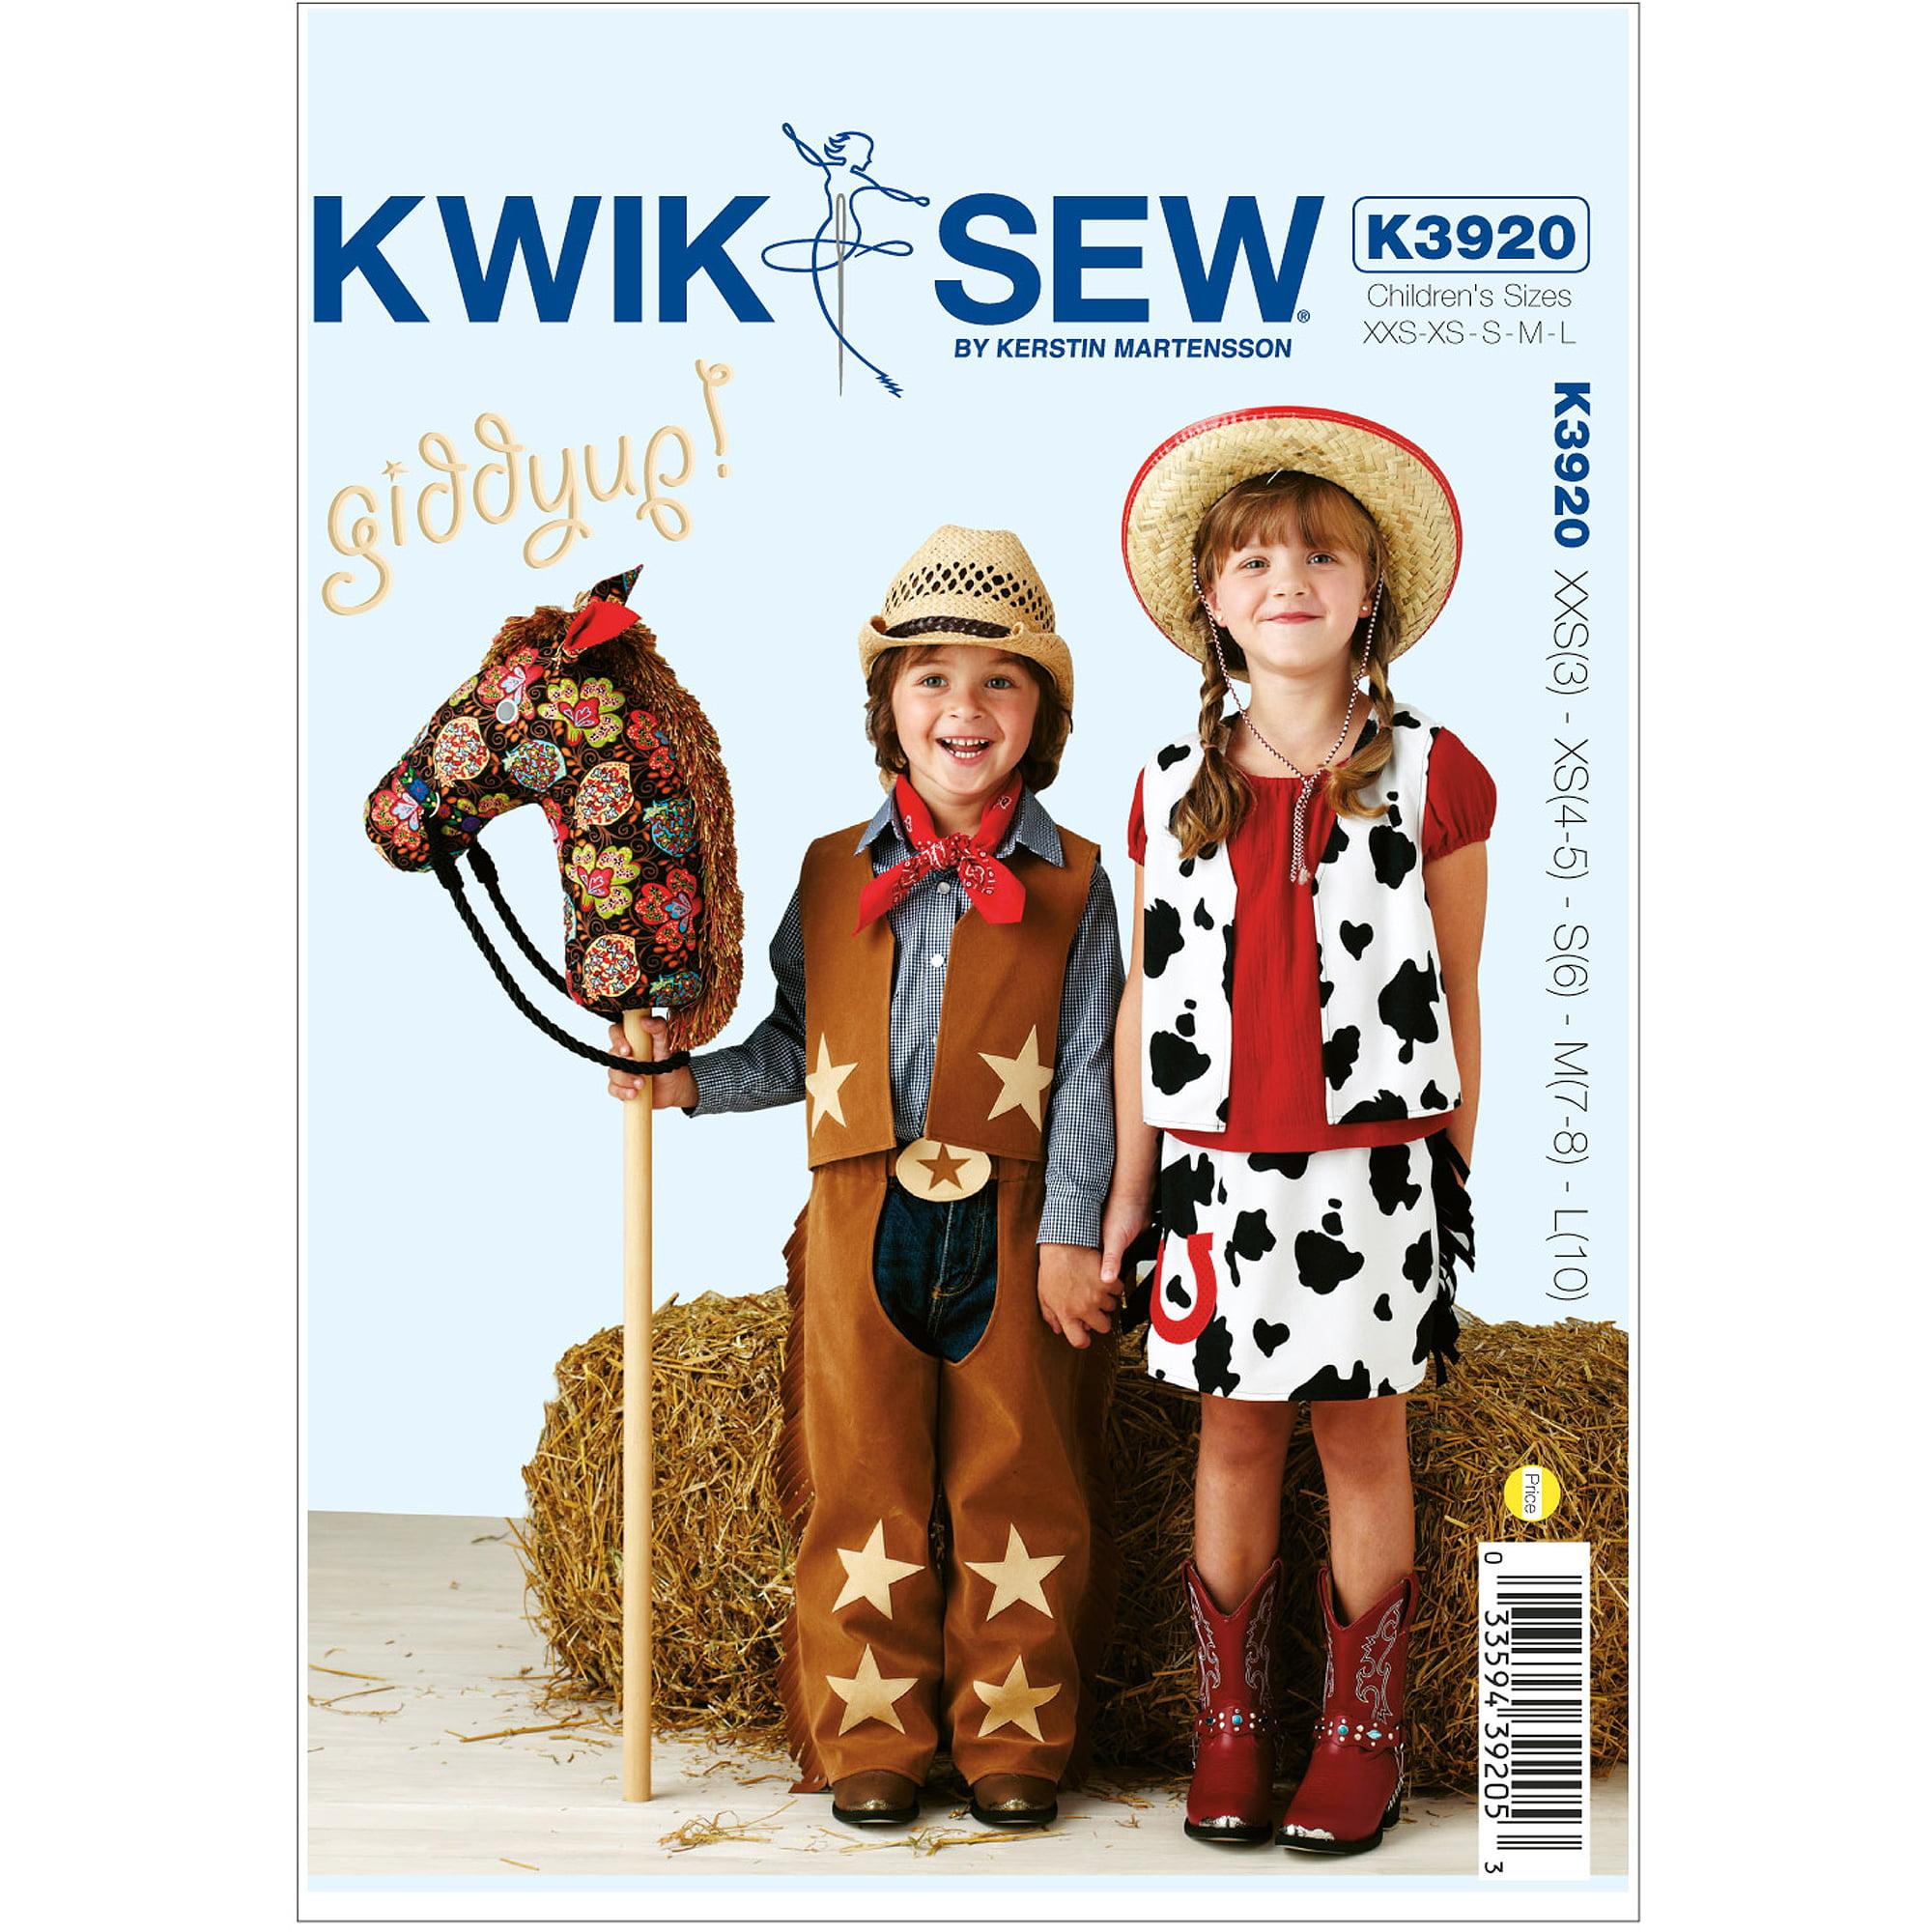 Kwik Sew Pattern Giddyup Chaps, Vest, Skirt and Pony, XXS(3), XS (4, 5), S (6), M (7, 8), L (10)